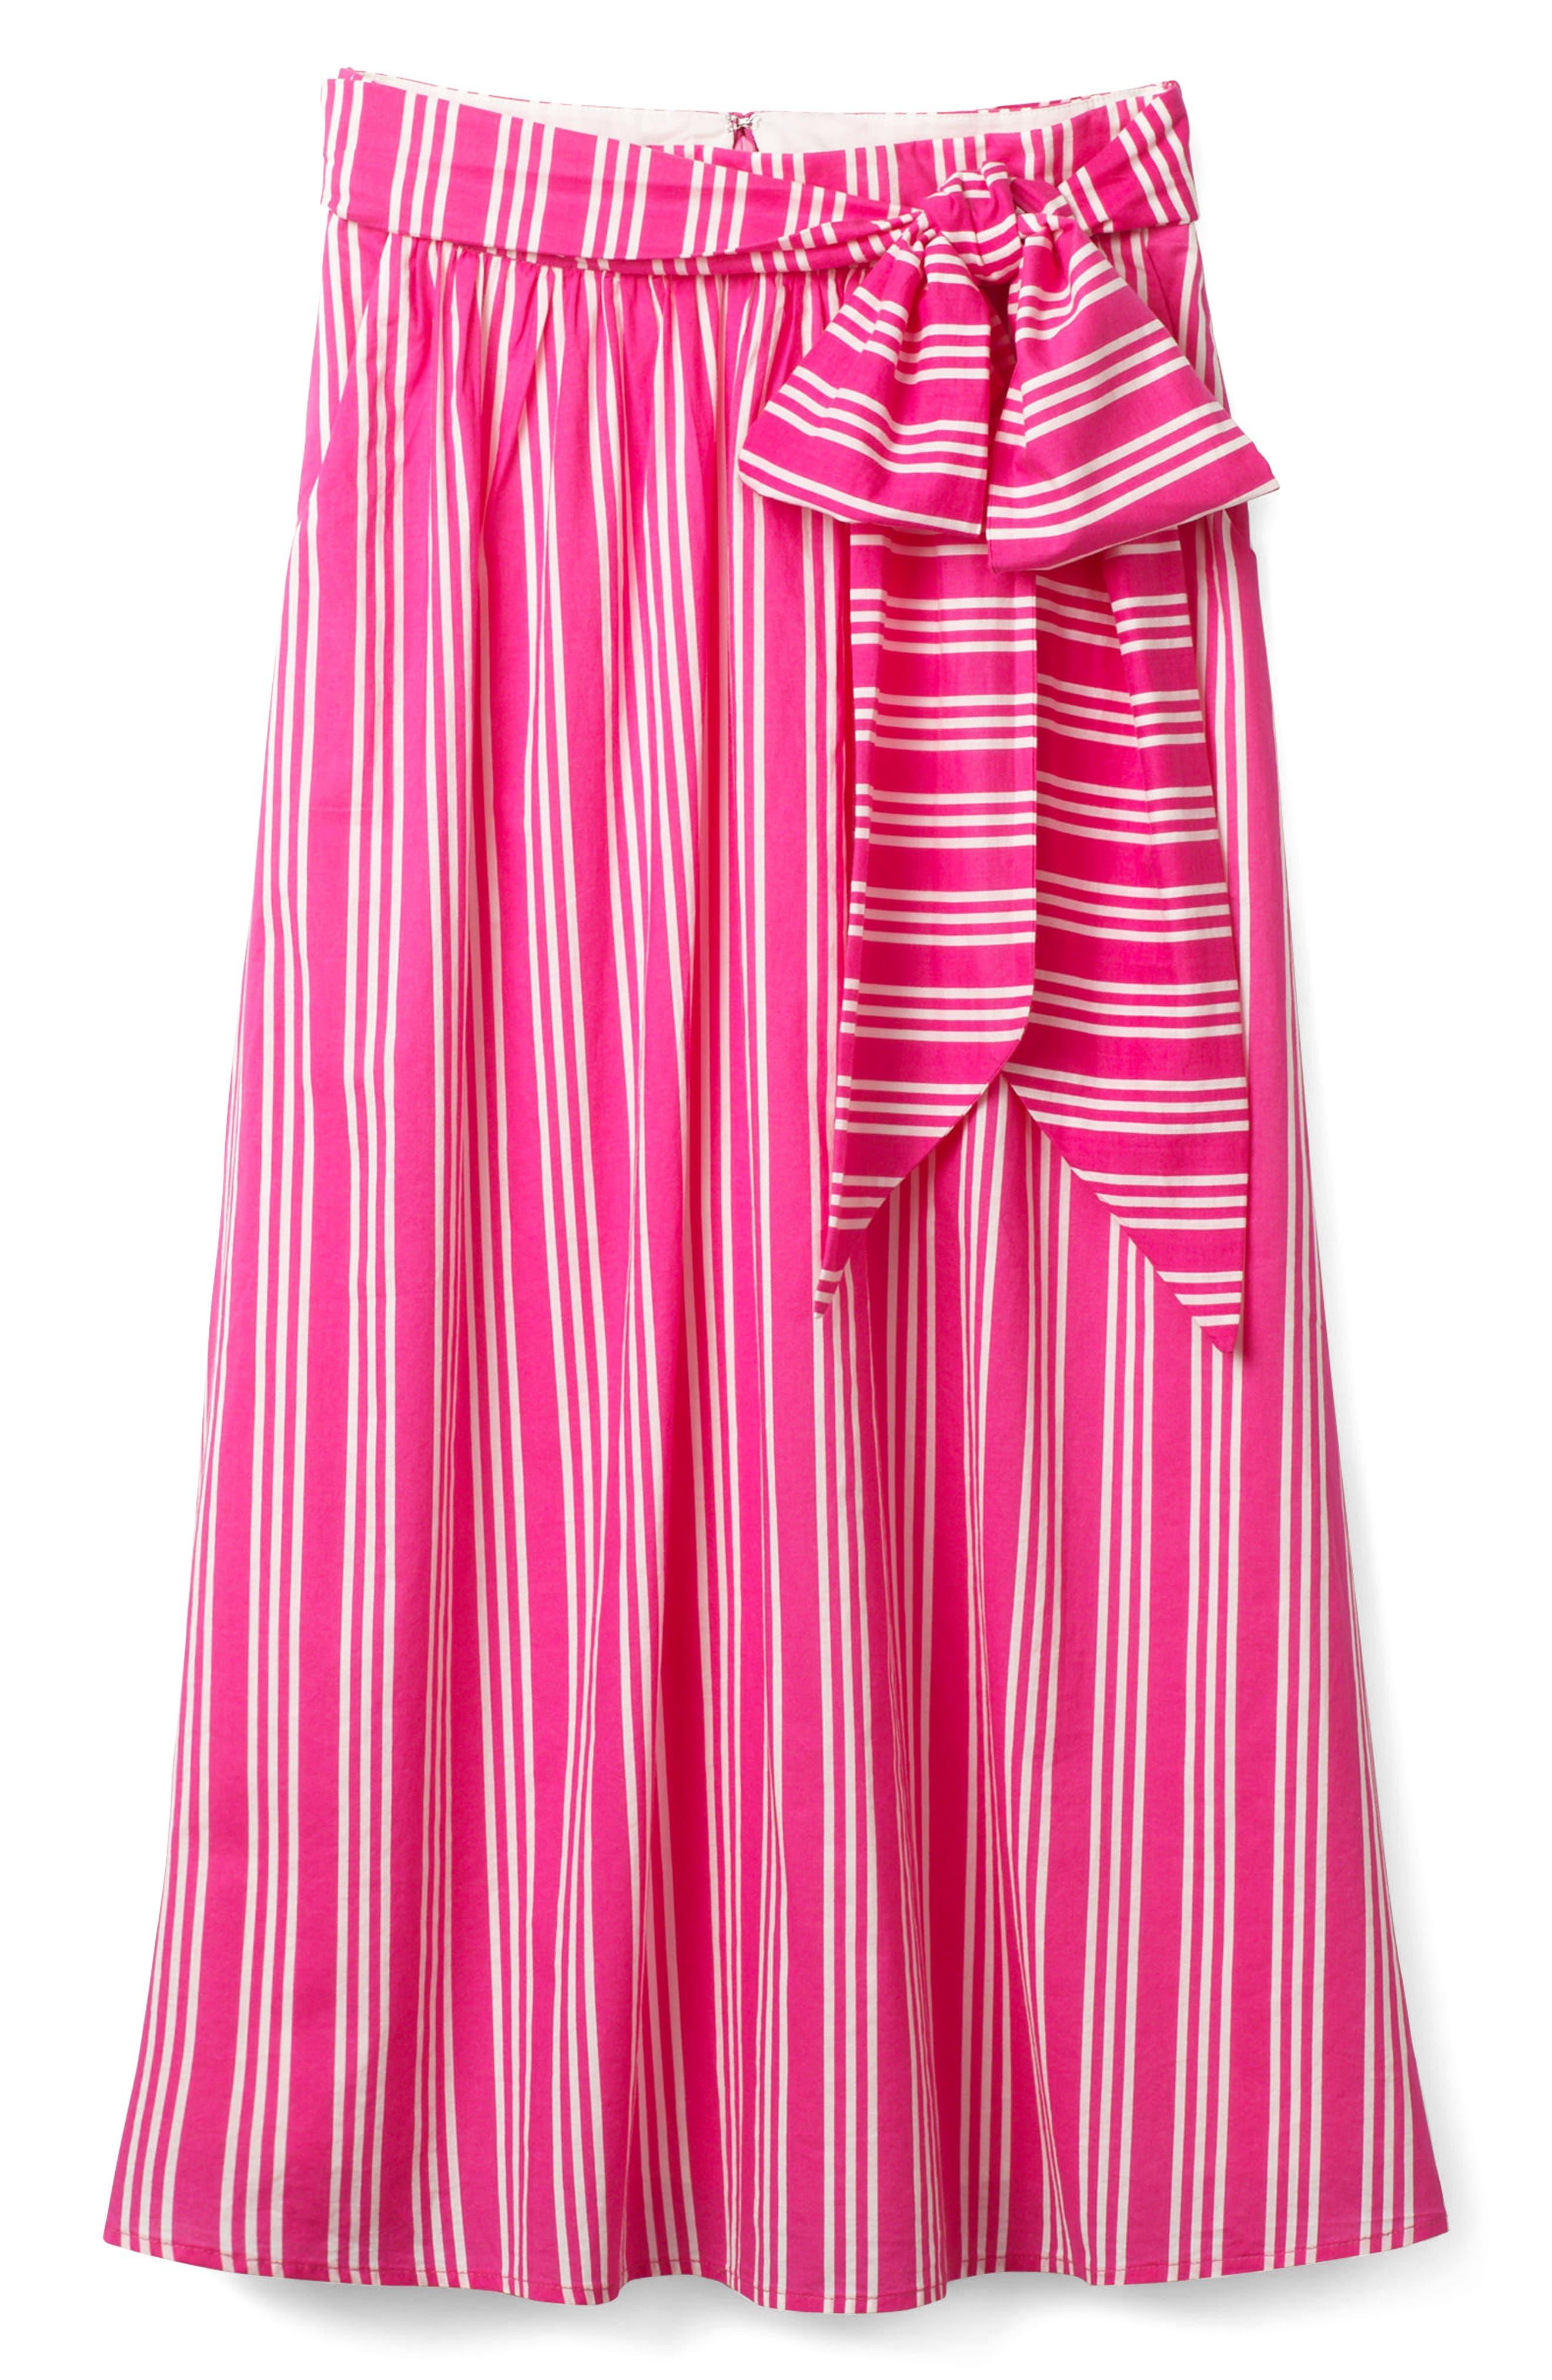 Kiera Midi Skirt,                             Alternate thumbnail 5, color,                             Party Pink And Ecru